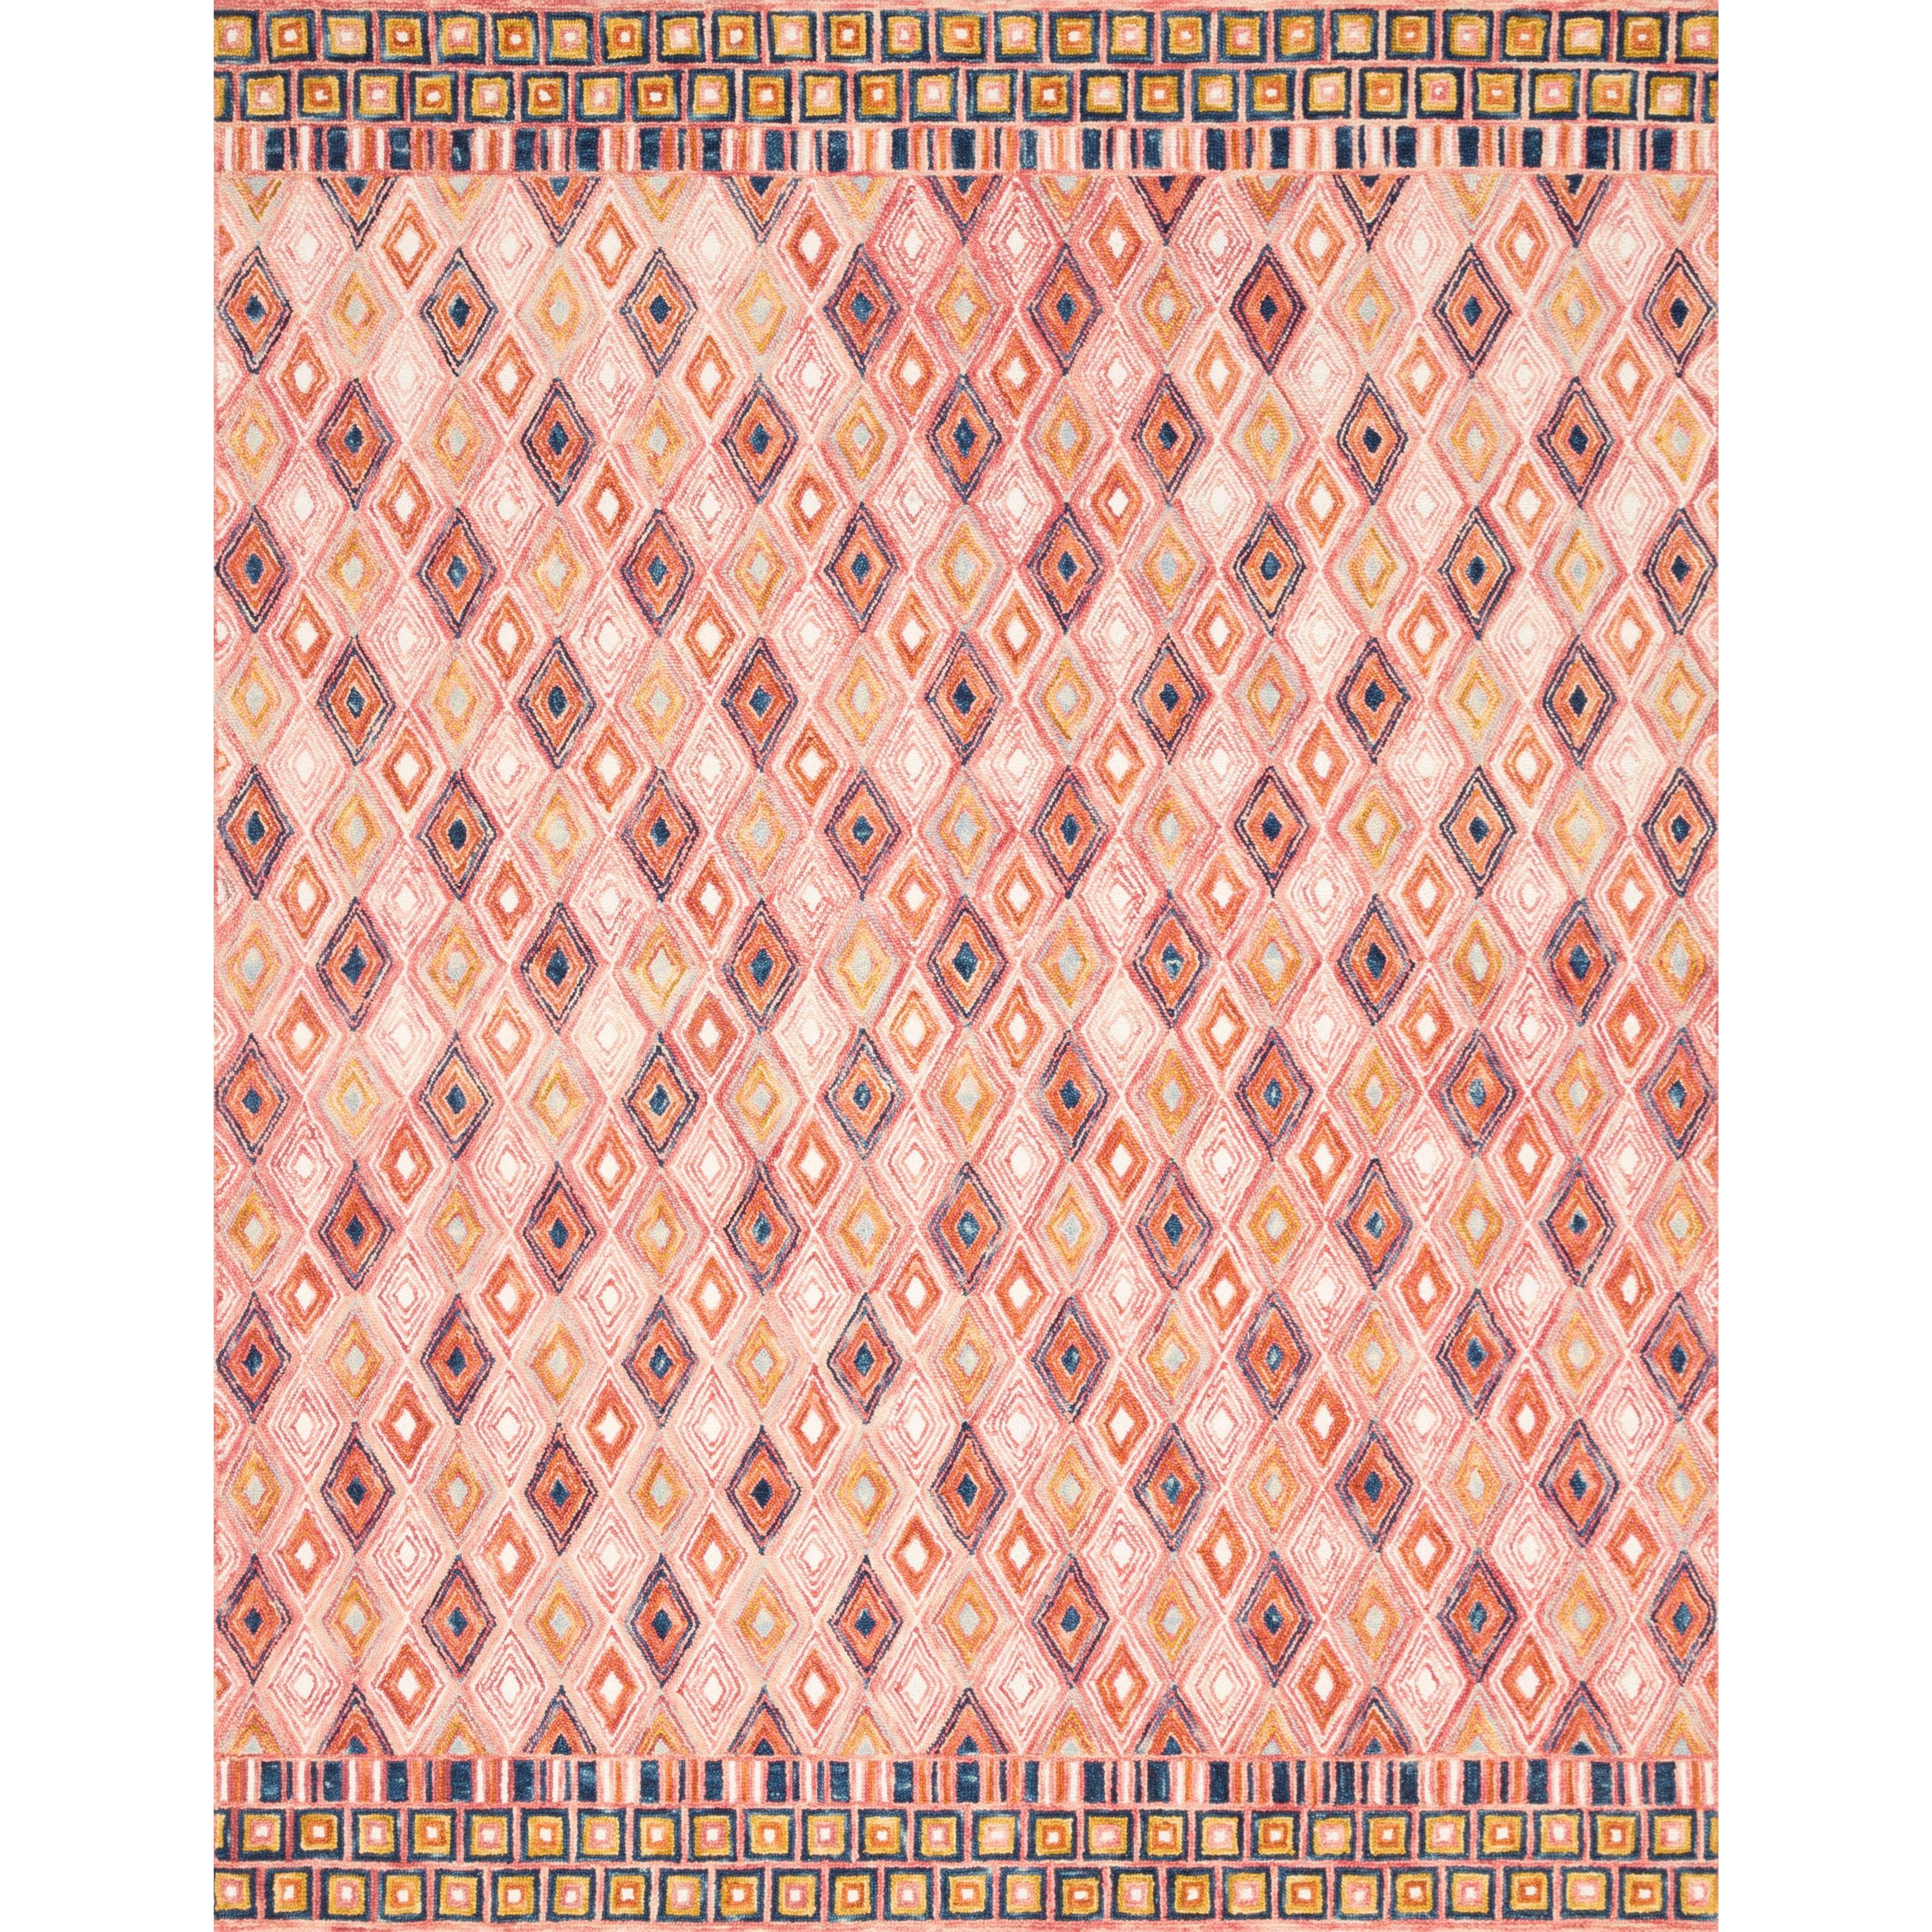 "Priti 5'0"" x 5'0"" Round Pink / Sunset Rug by Loloi Rugs at Virginia Furniture Market"